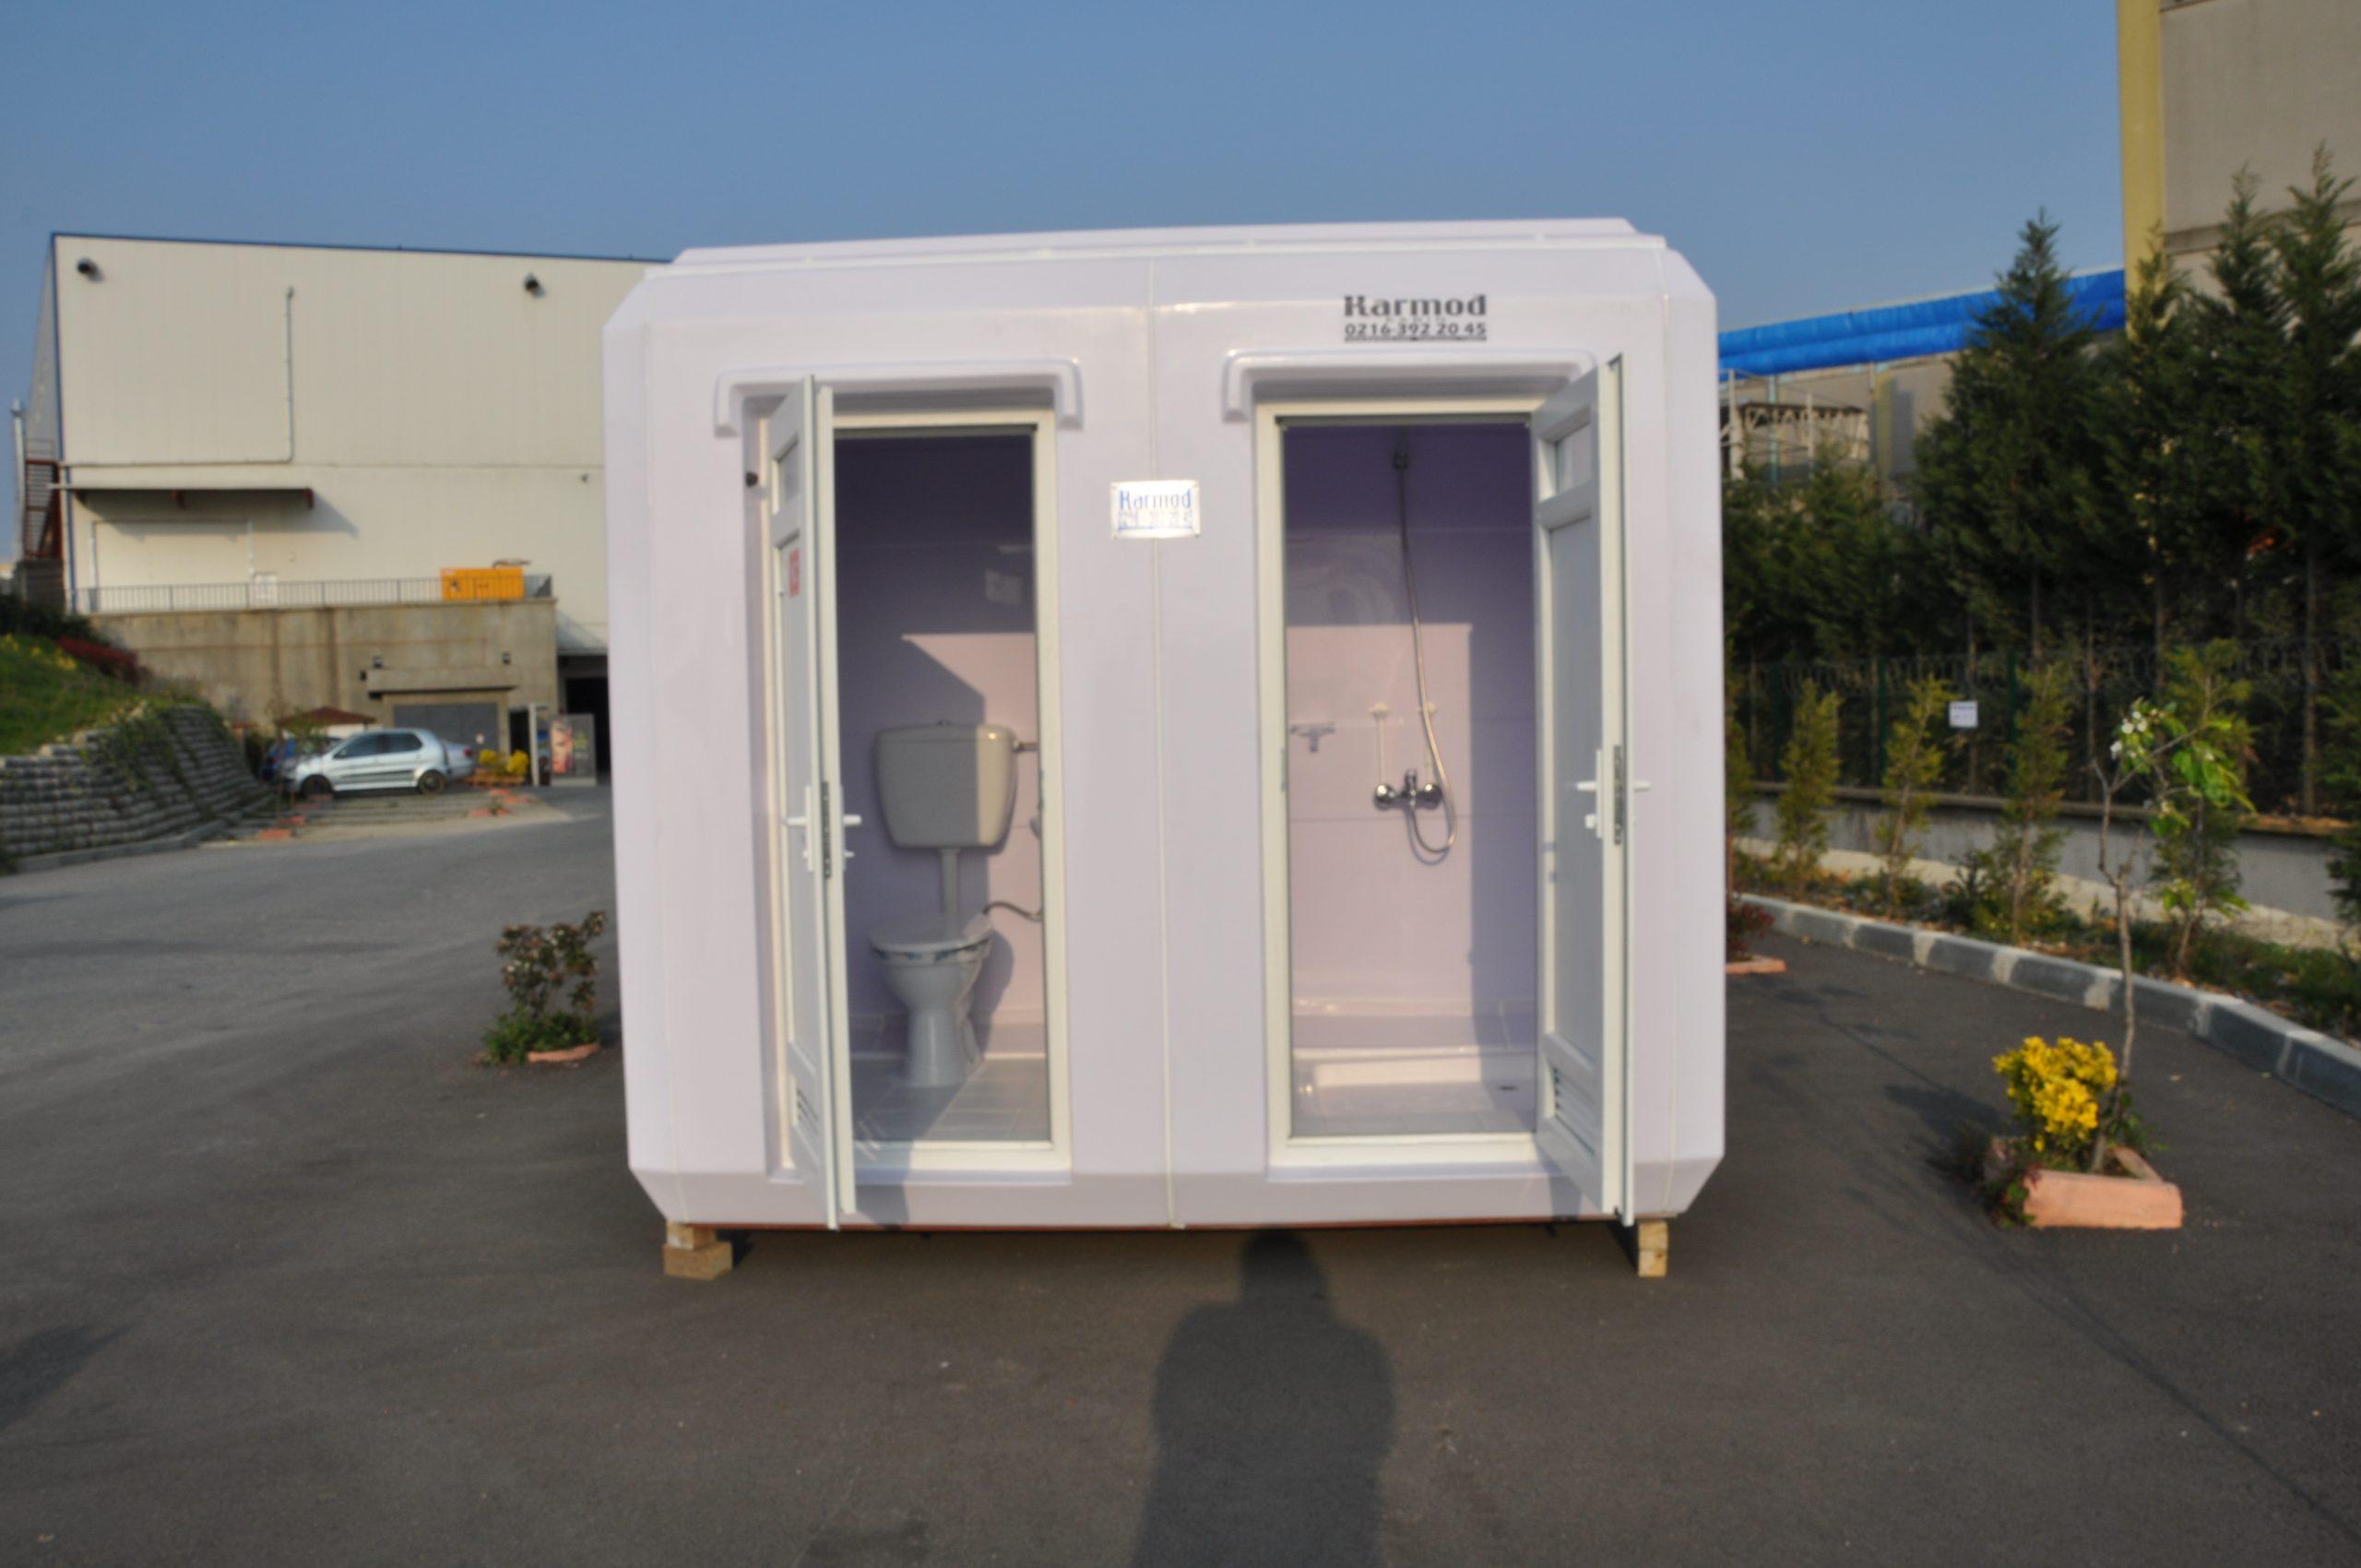 Restroom or Toilets